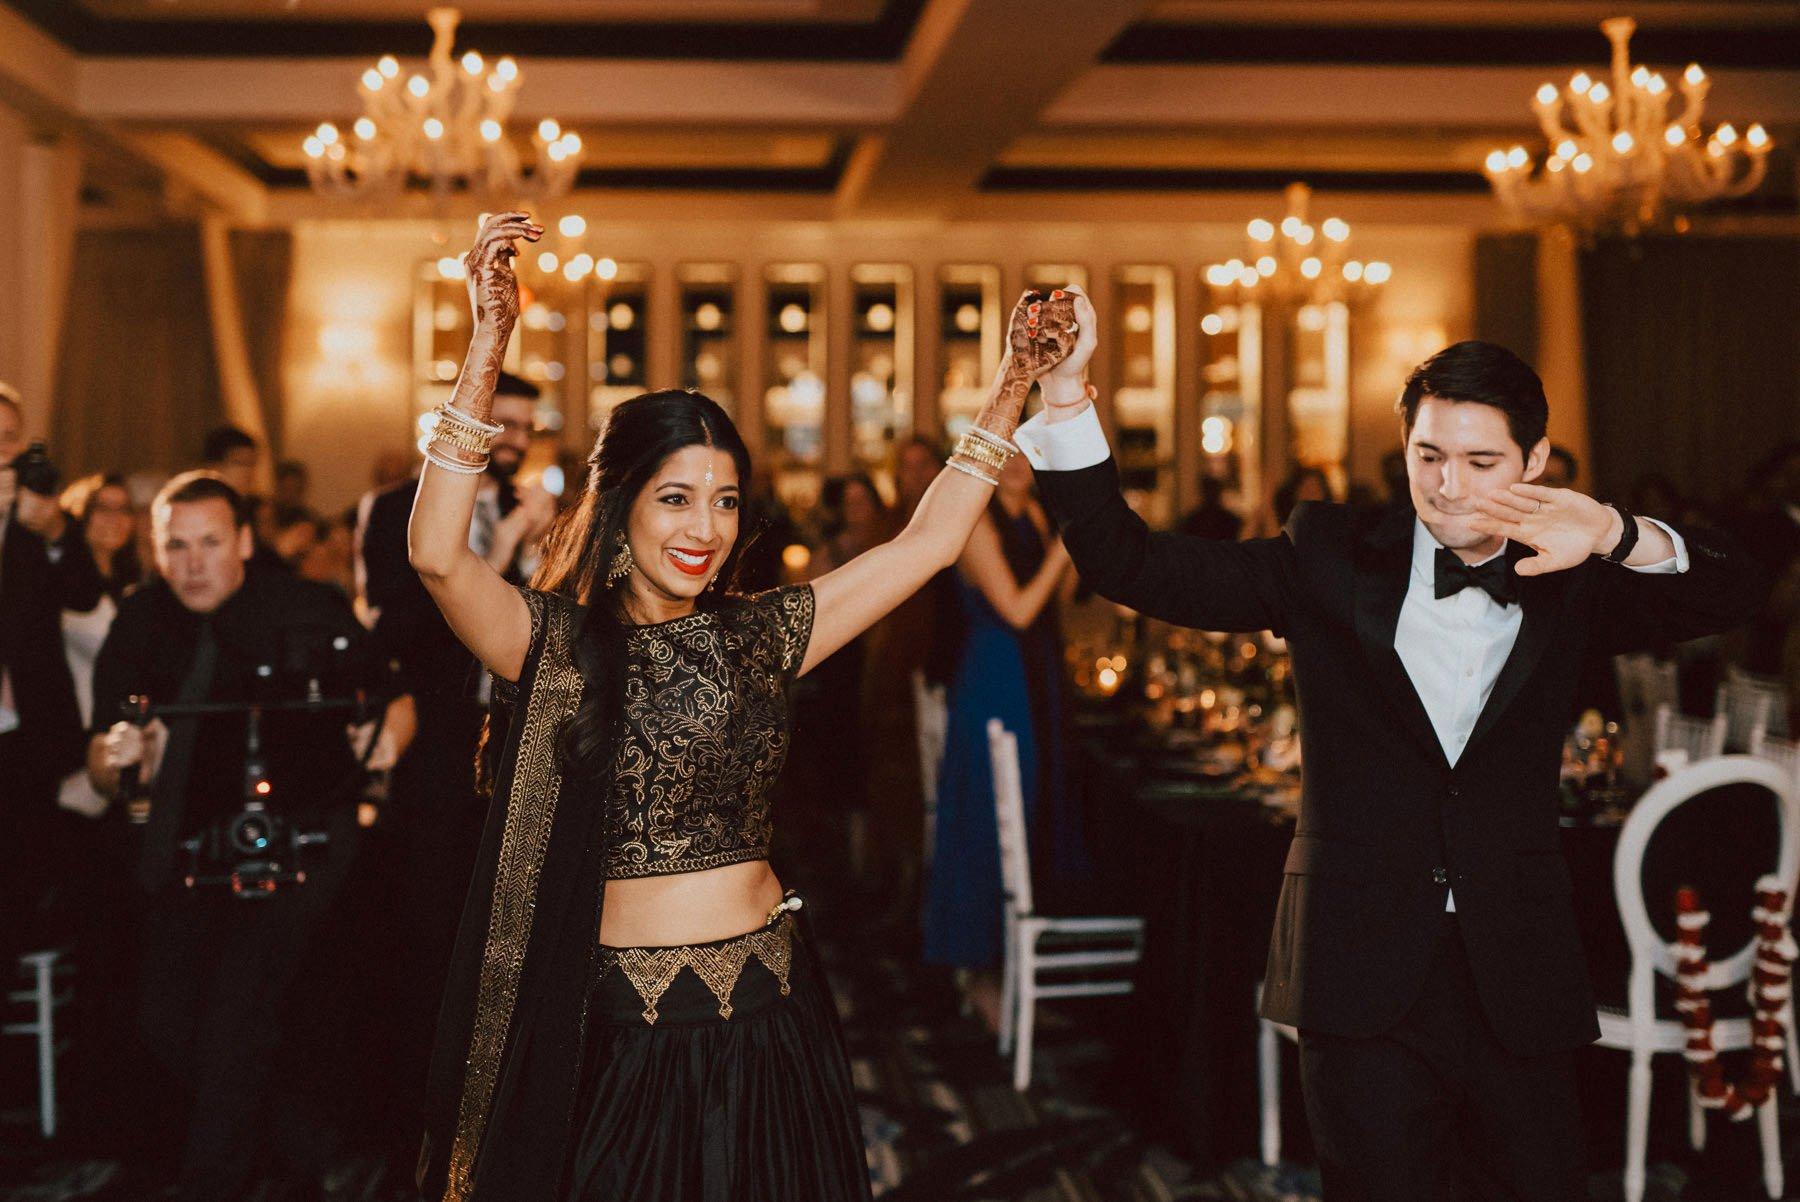 vie-philadelphia-indian-wedding-104.jpg